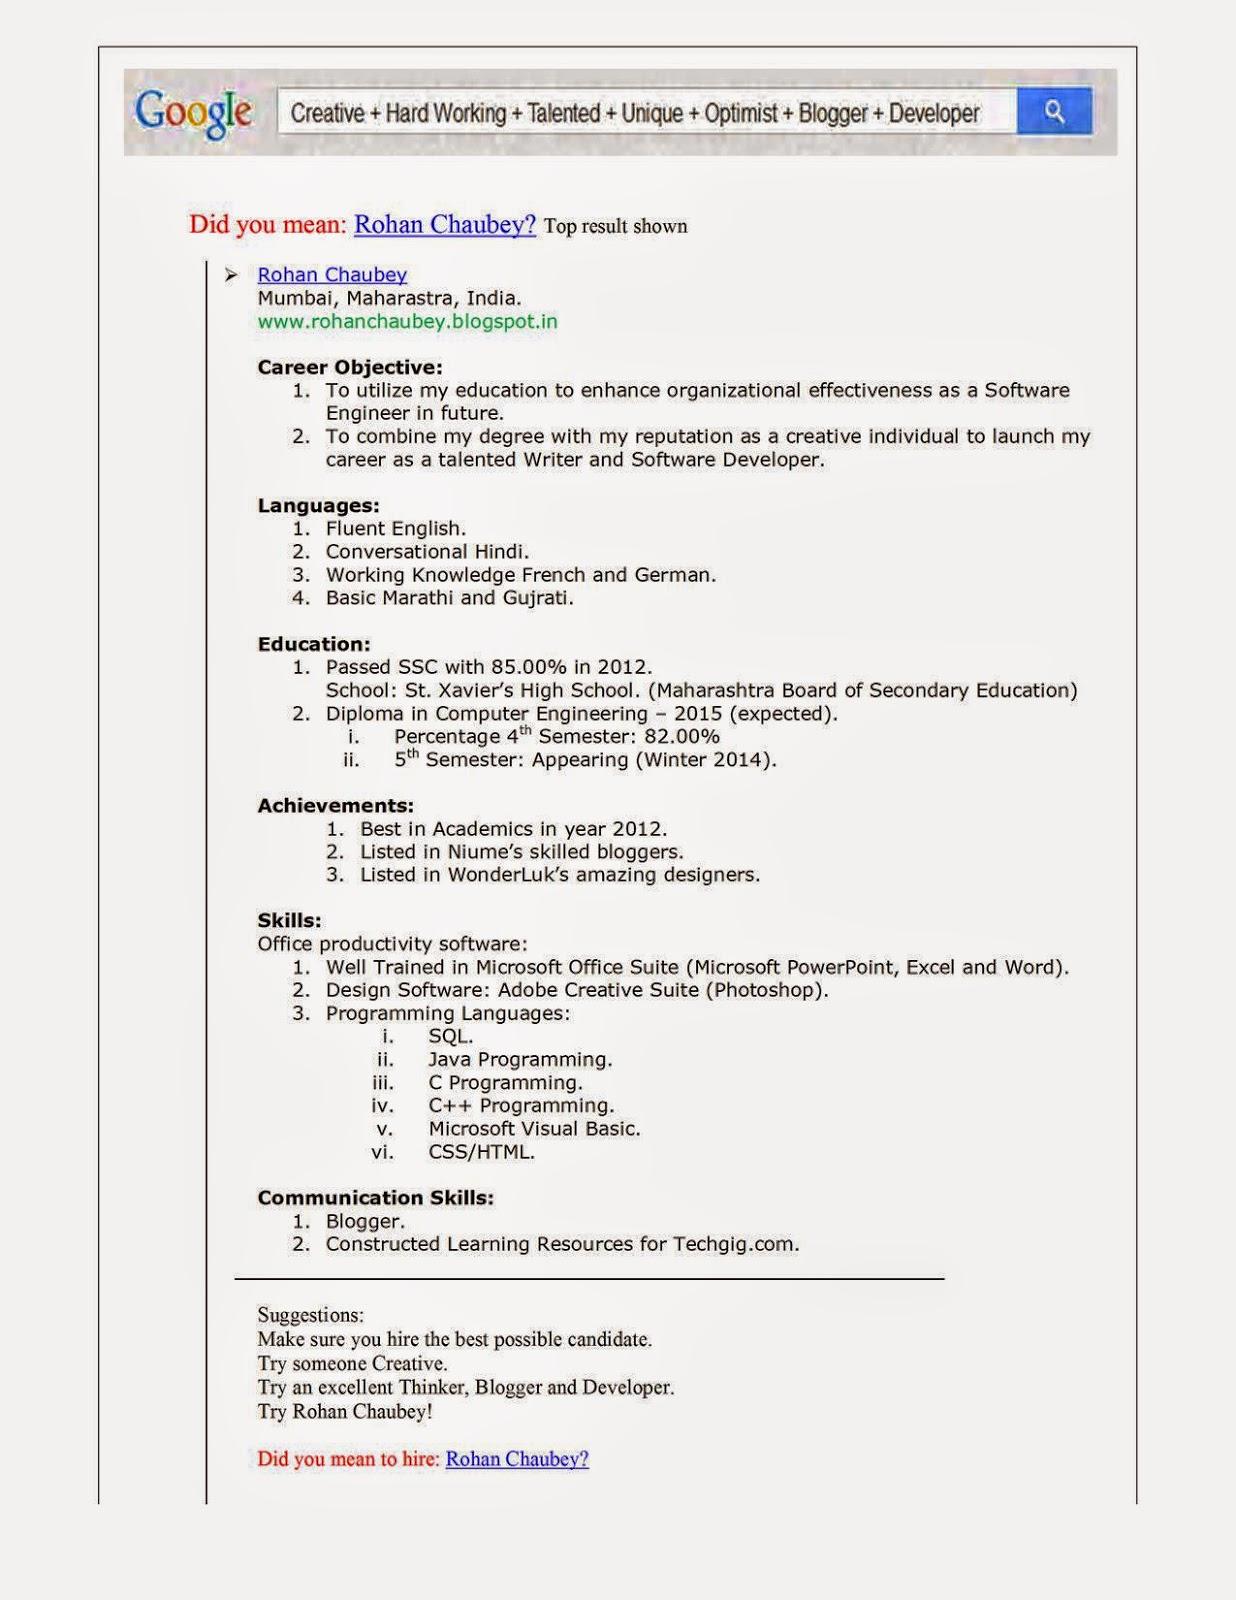 My Google Resume  Google Is My Resume